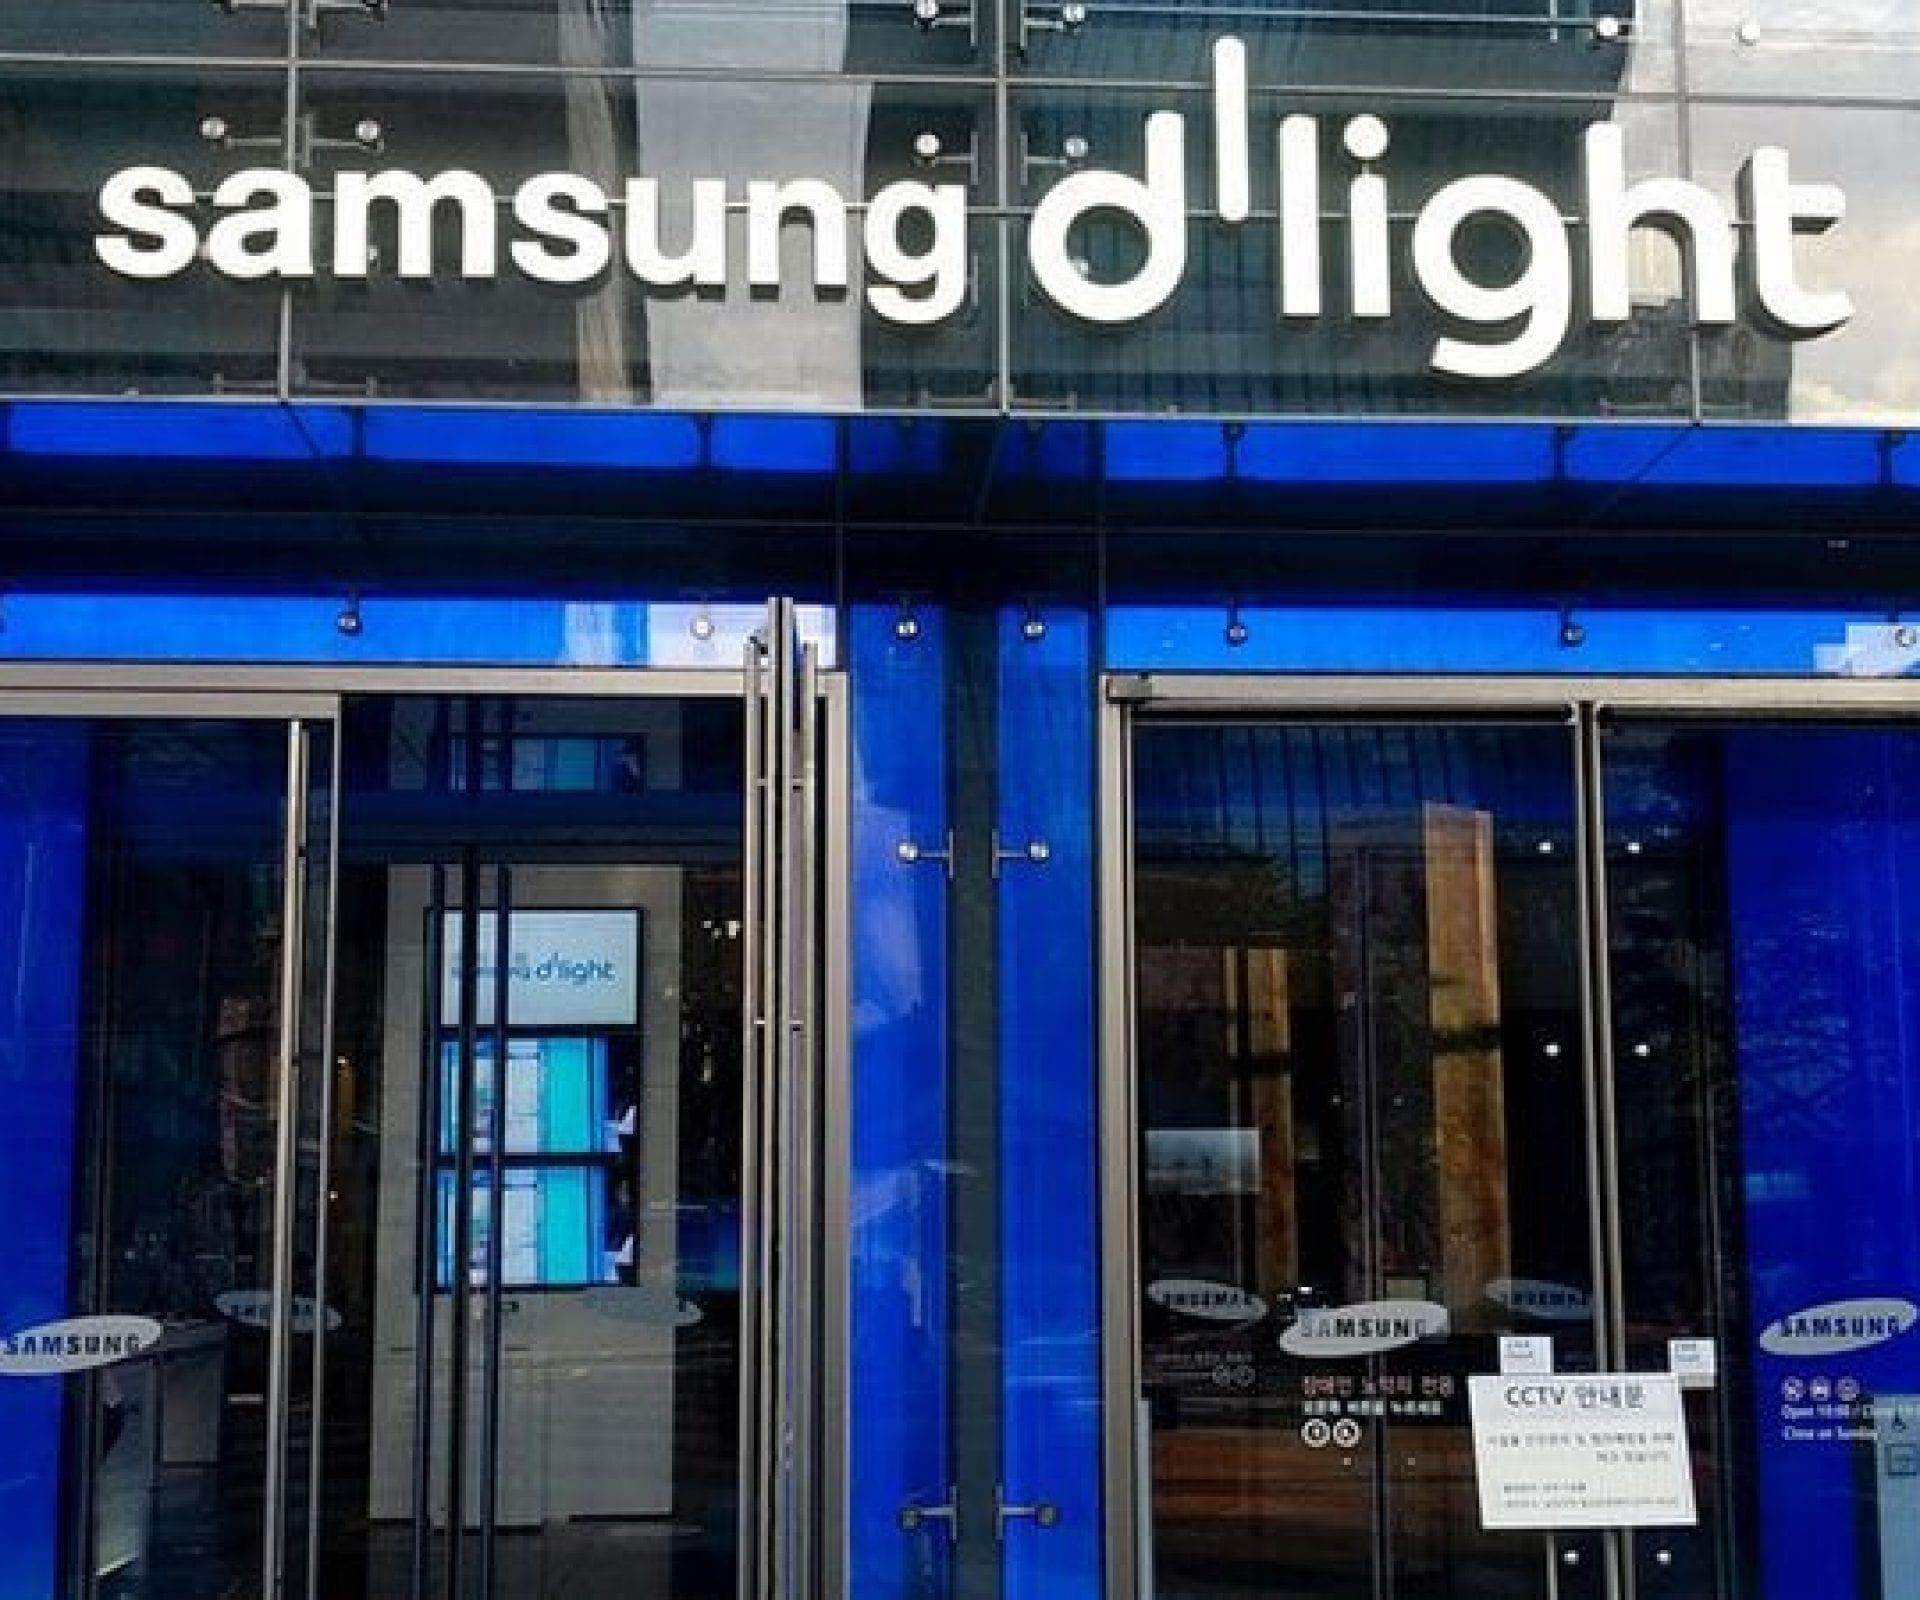 Samsung D'light | Seocho-dong, Seoul